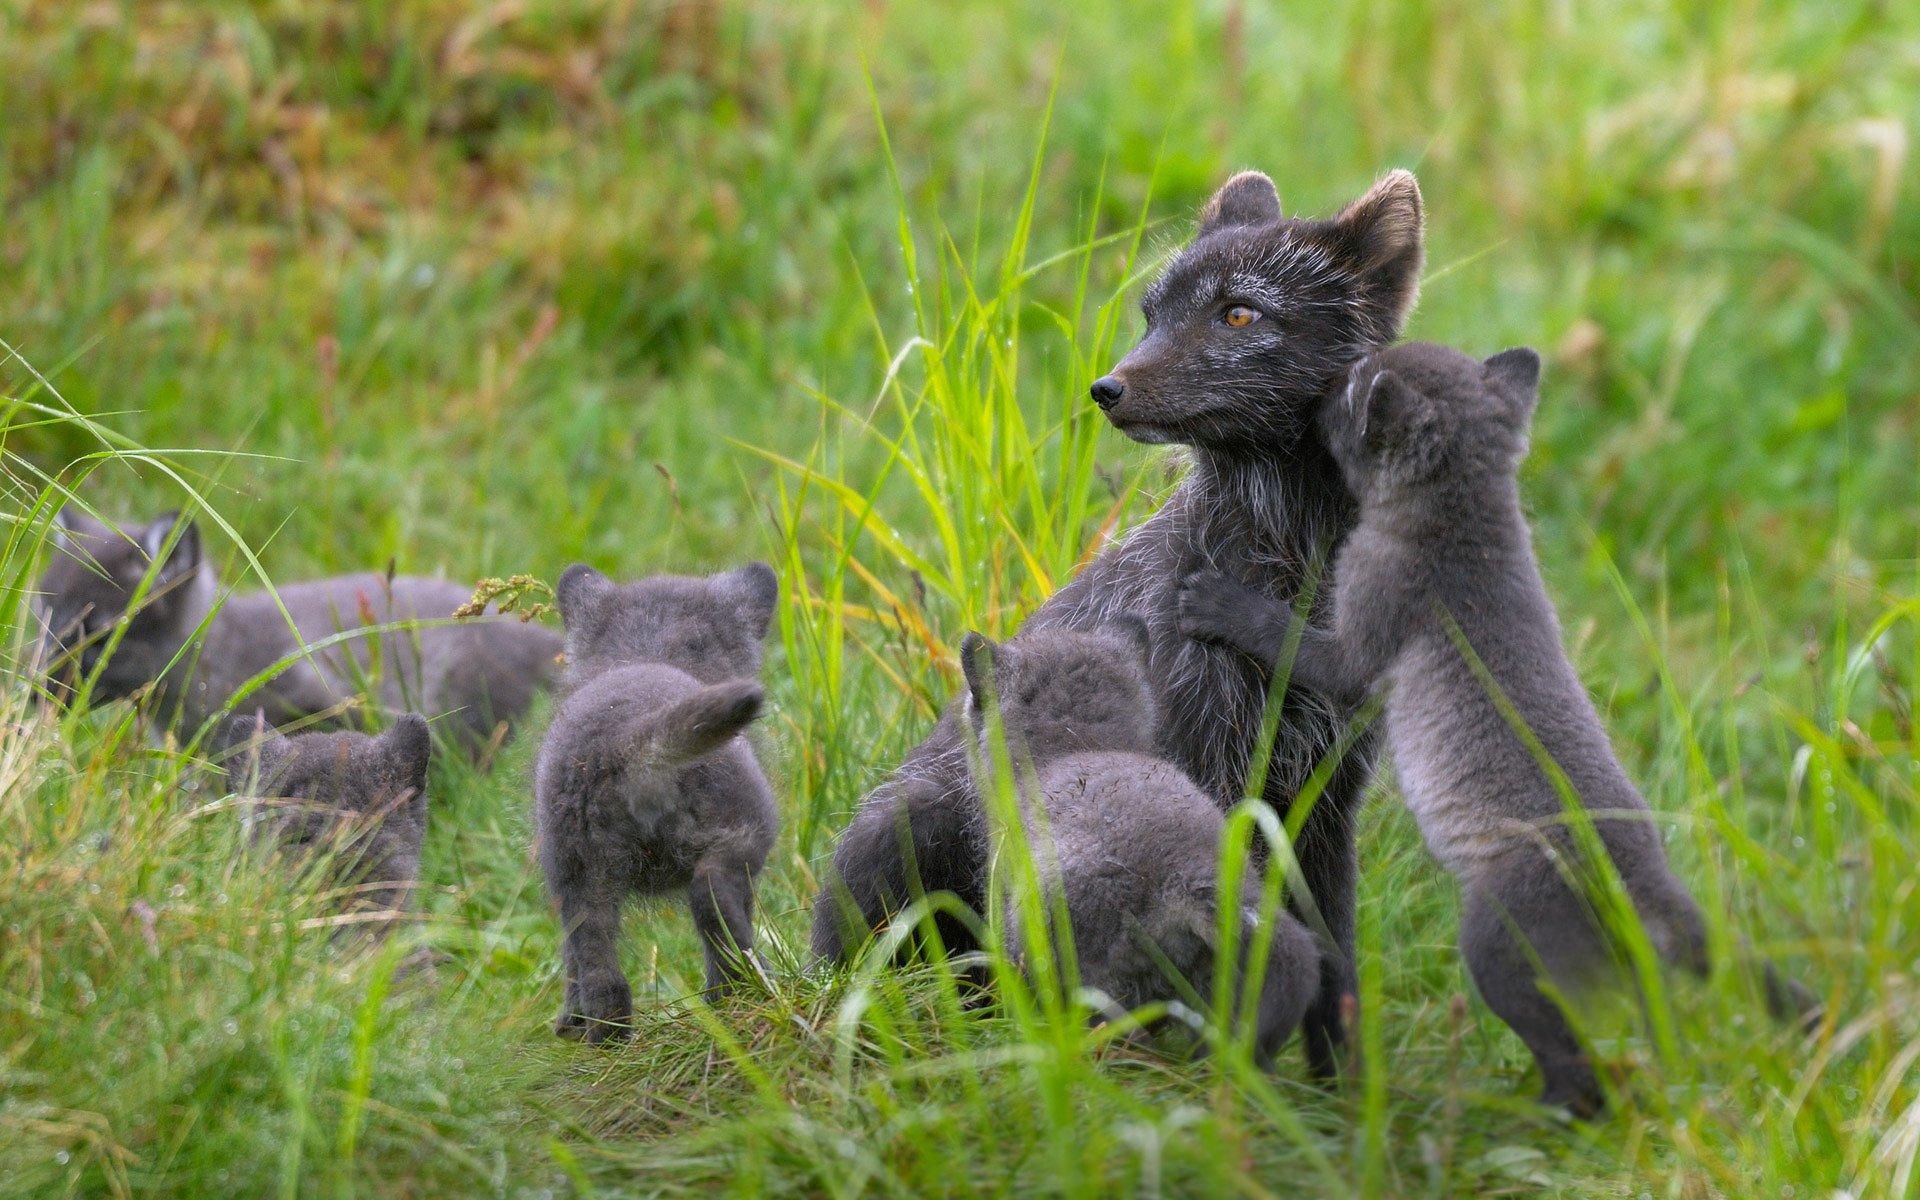 Cute Little Puppies Wallpapers Finland Polar Fox Lapland Puppy Baby Wallpaper 1920x1200